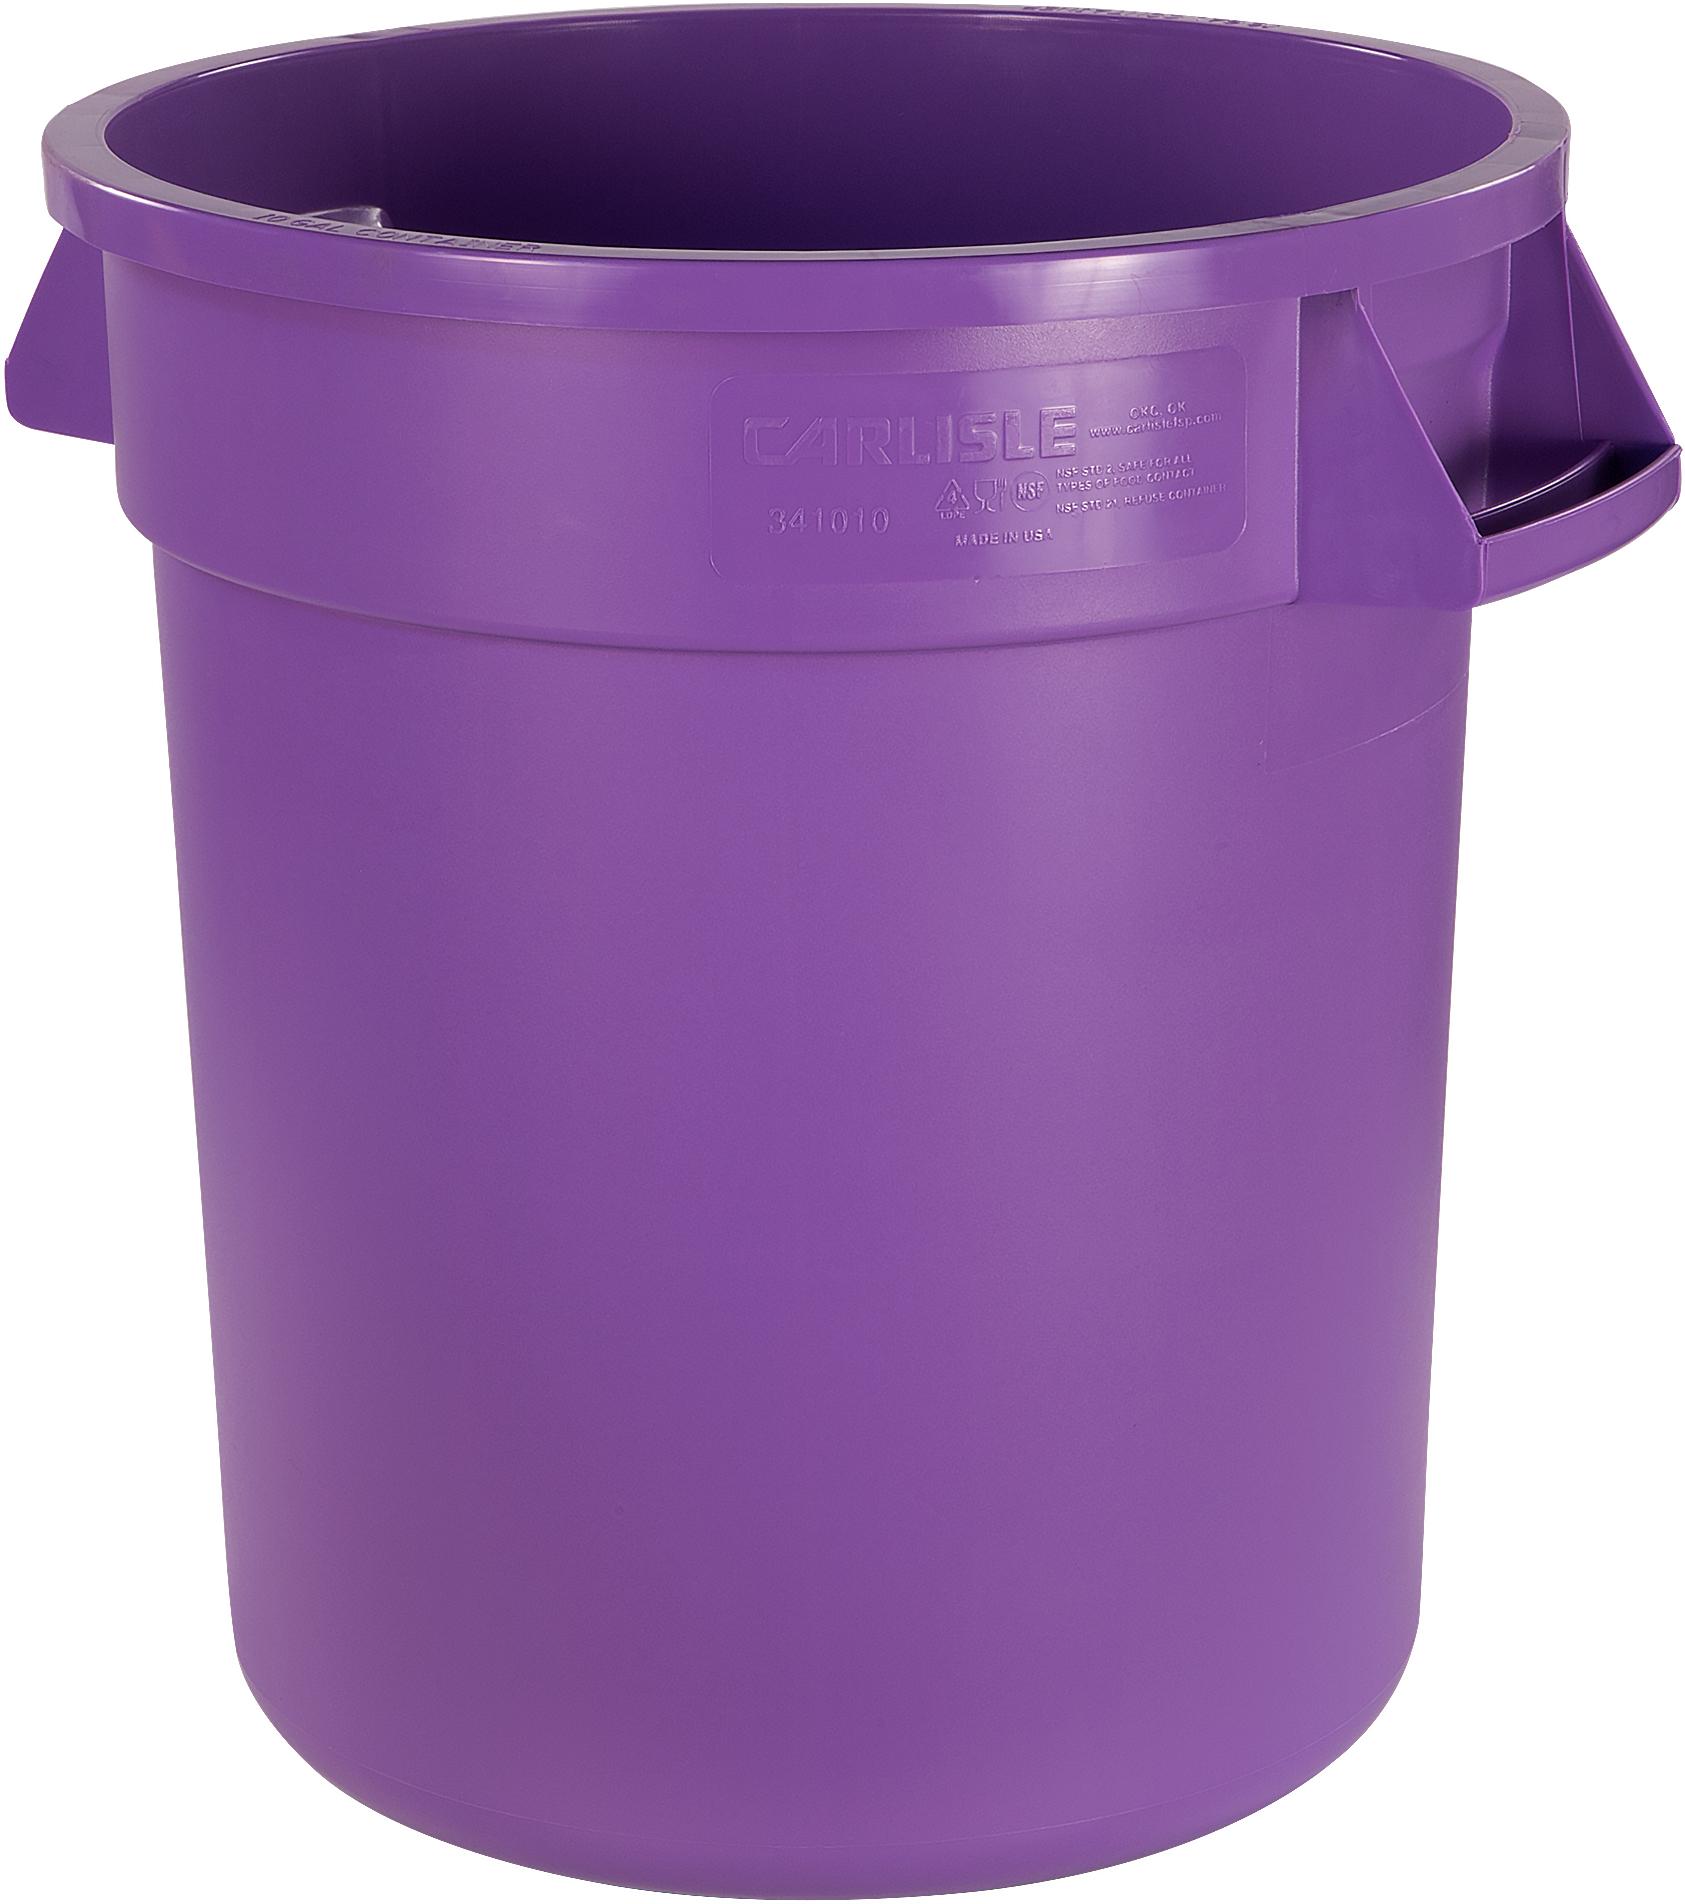 Bronco Round Waste Bin Food Container 10 Gallon - Purple